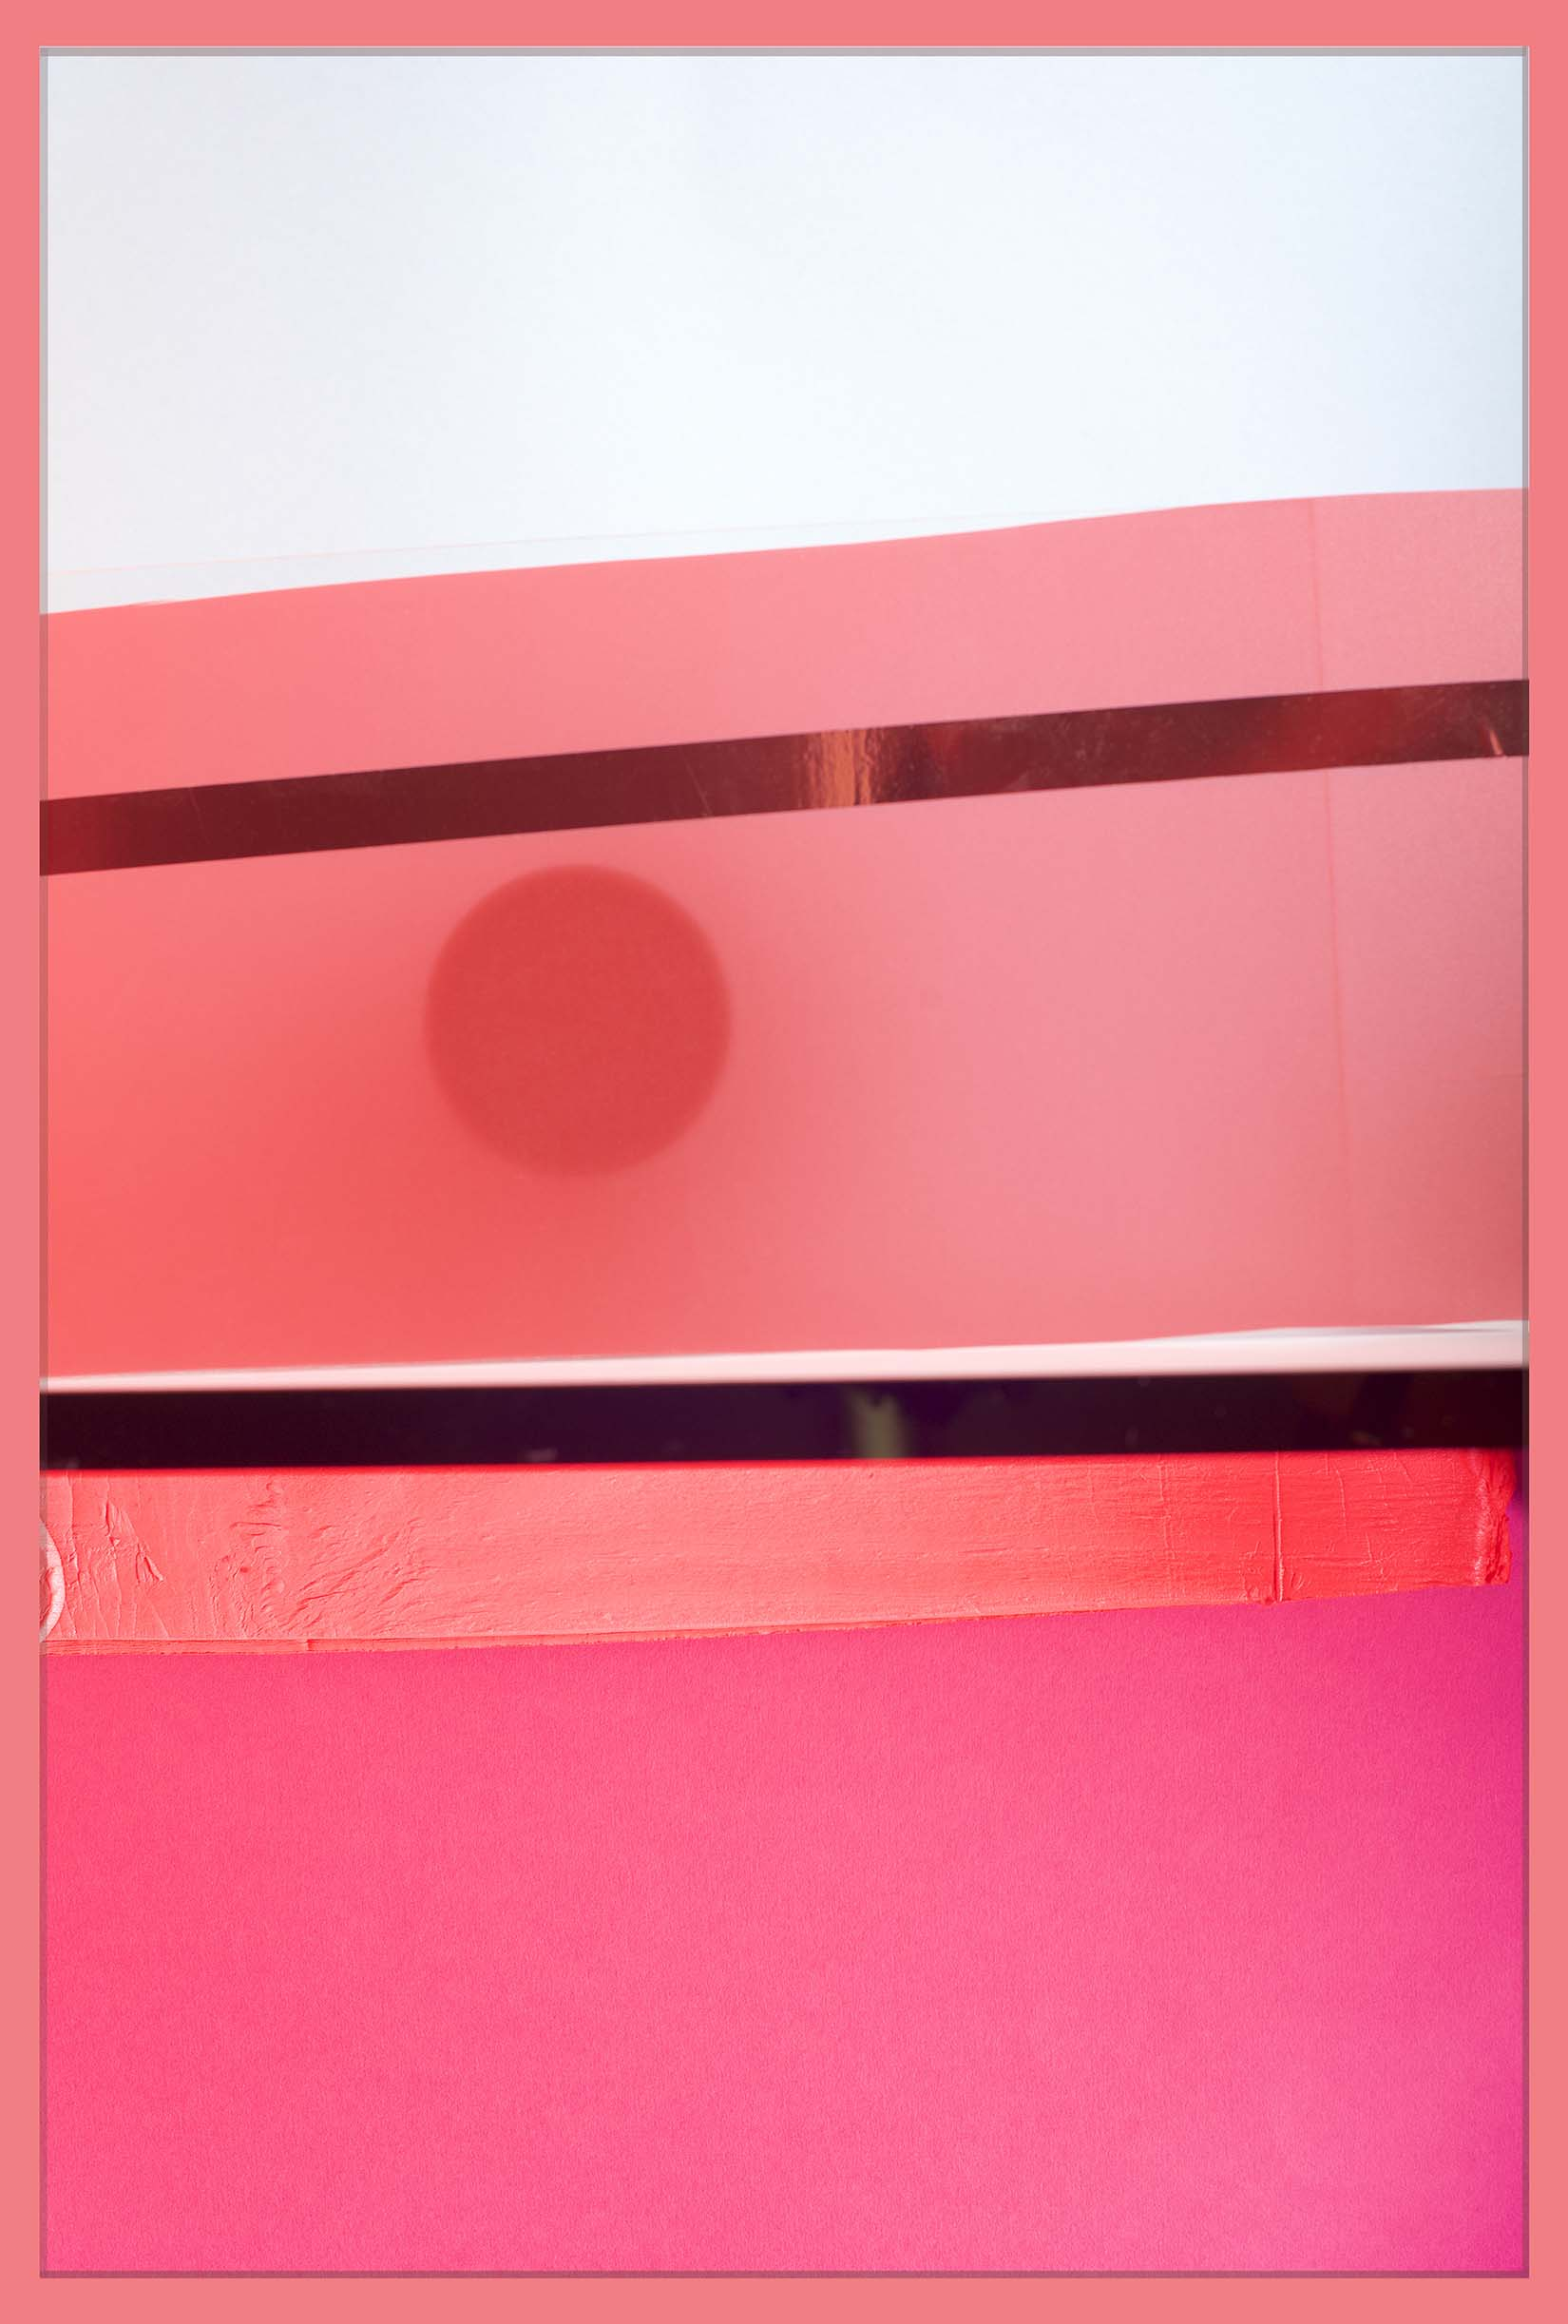 LYDIA WEGNER   Circle Haze  2017 Archival inkjet print 80 x 53.5 cm